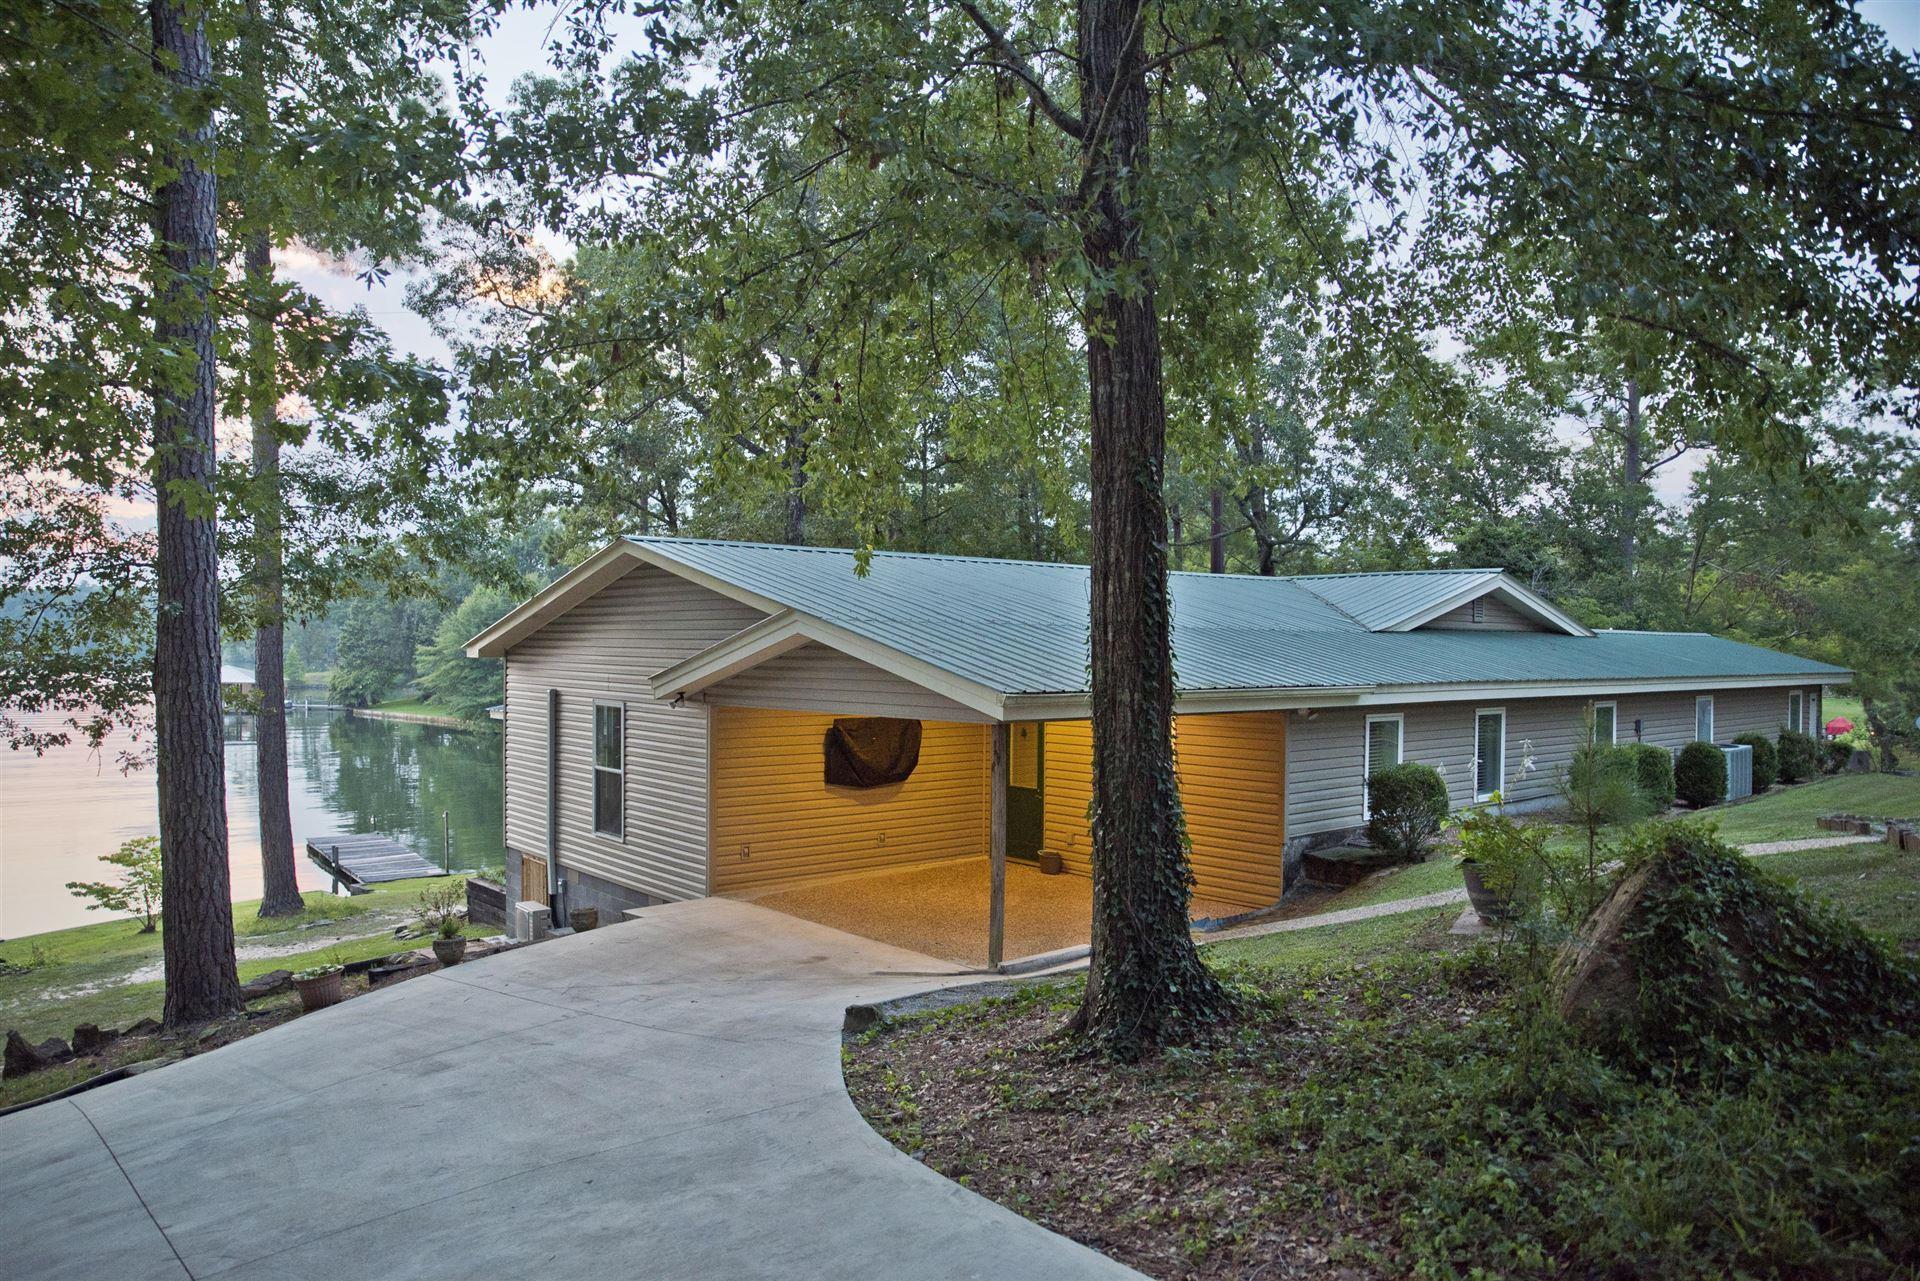 432 Timber Cove Dr, Jacksons Gap, AL 36861 - #: 20-958